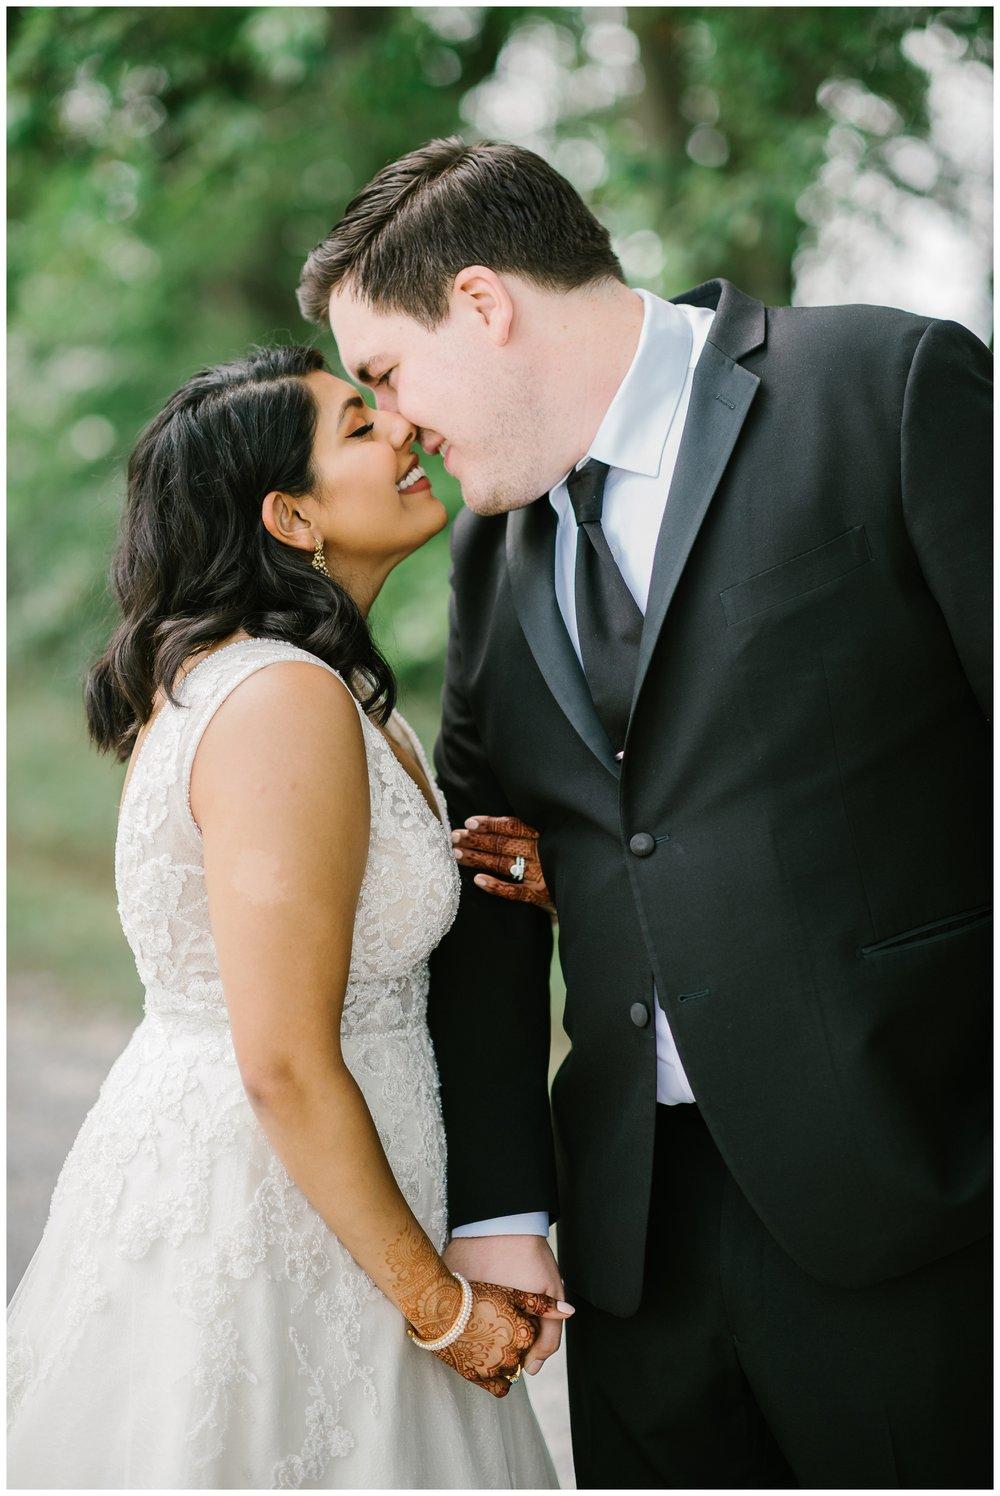 Rebecca_Bridges_Photography_Indianapolis_Wedding_Photographer_6913.jpg